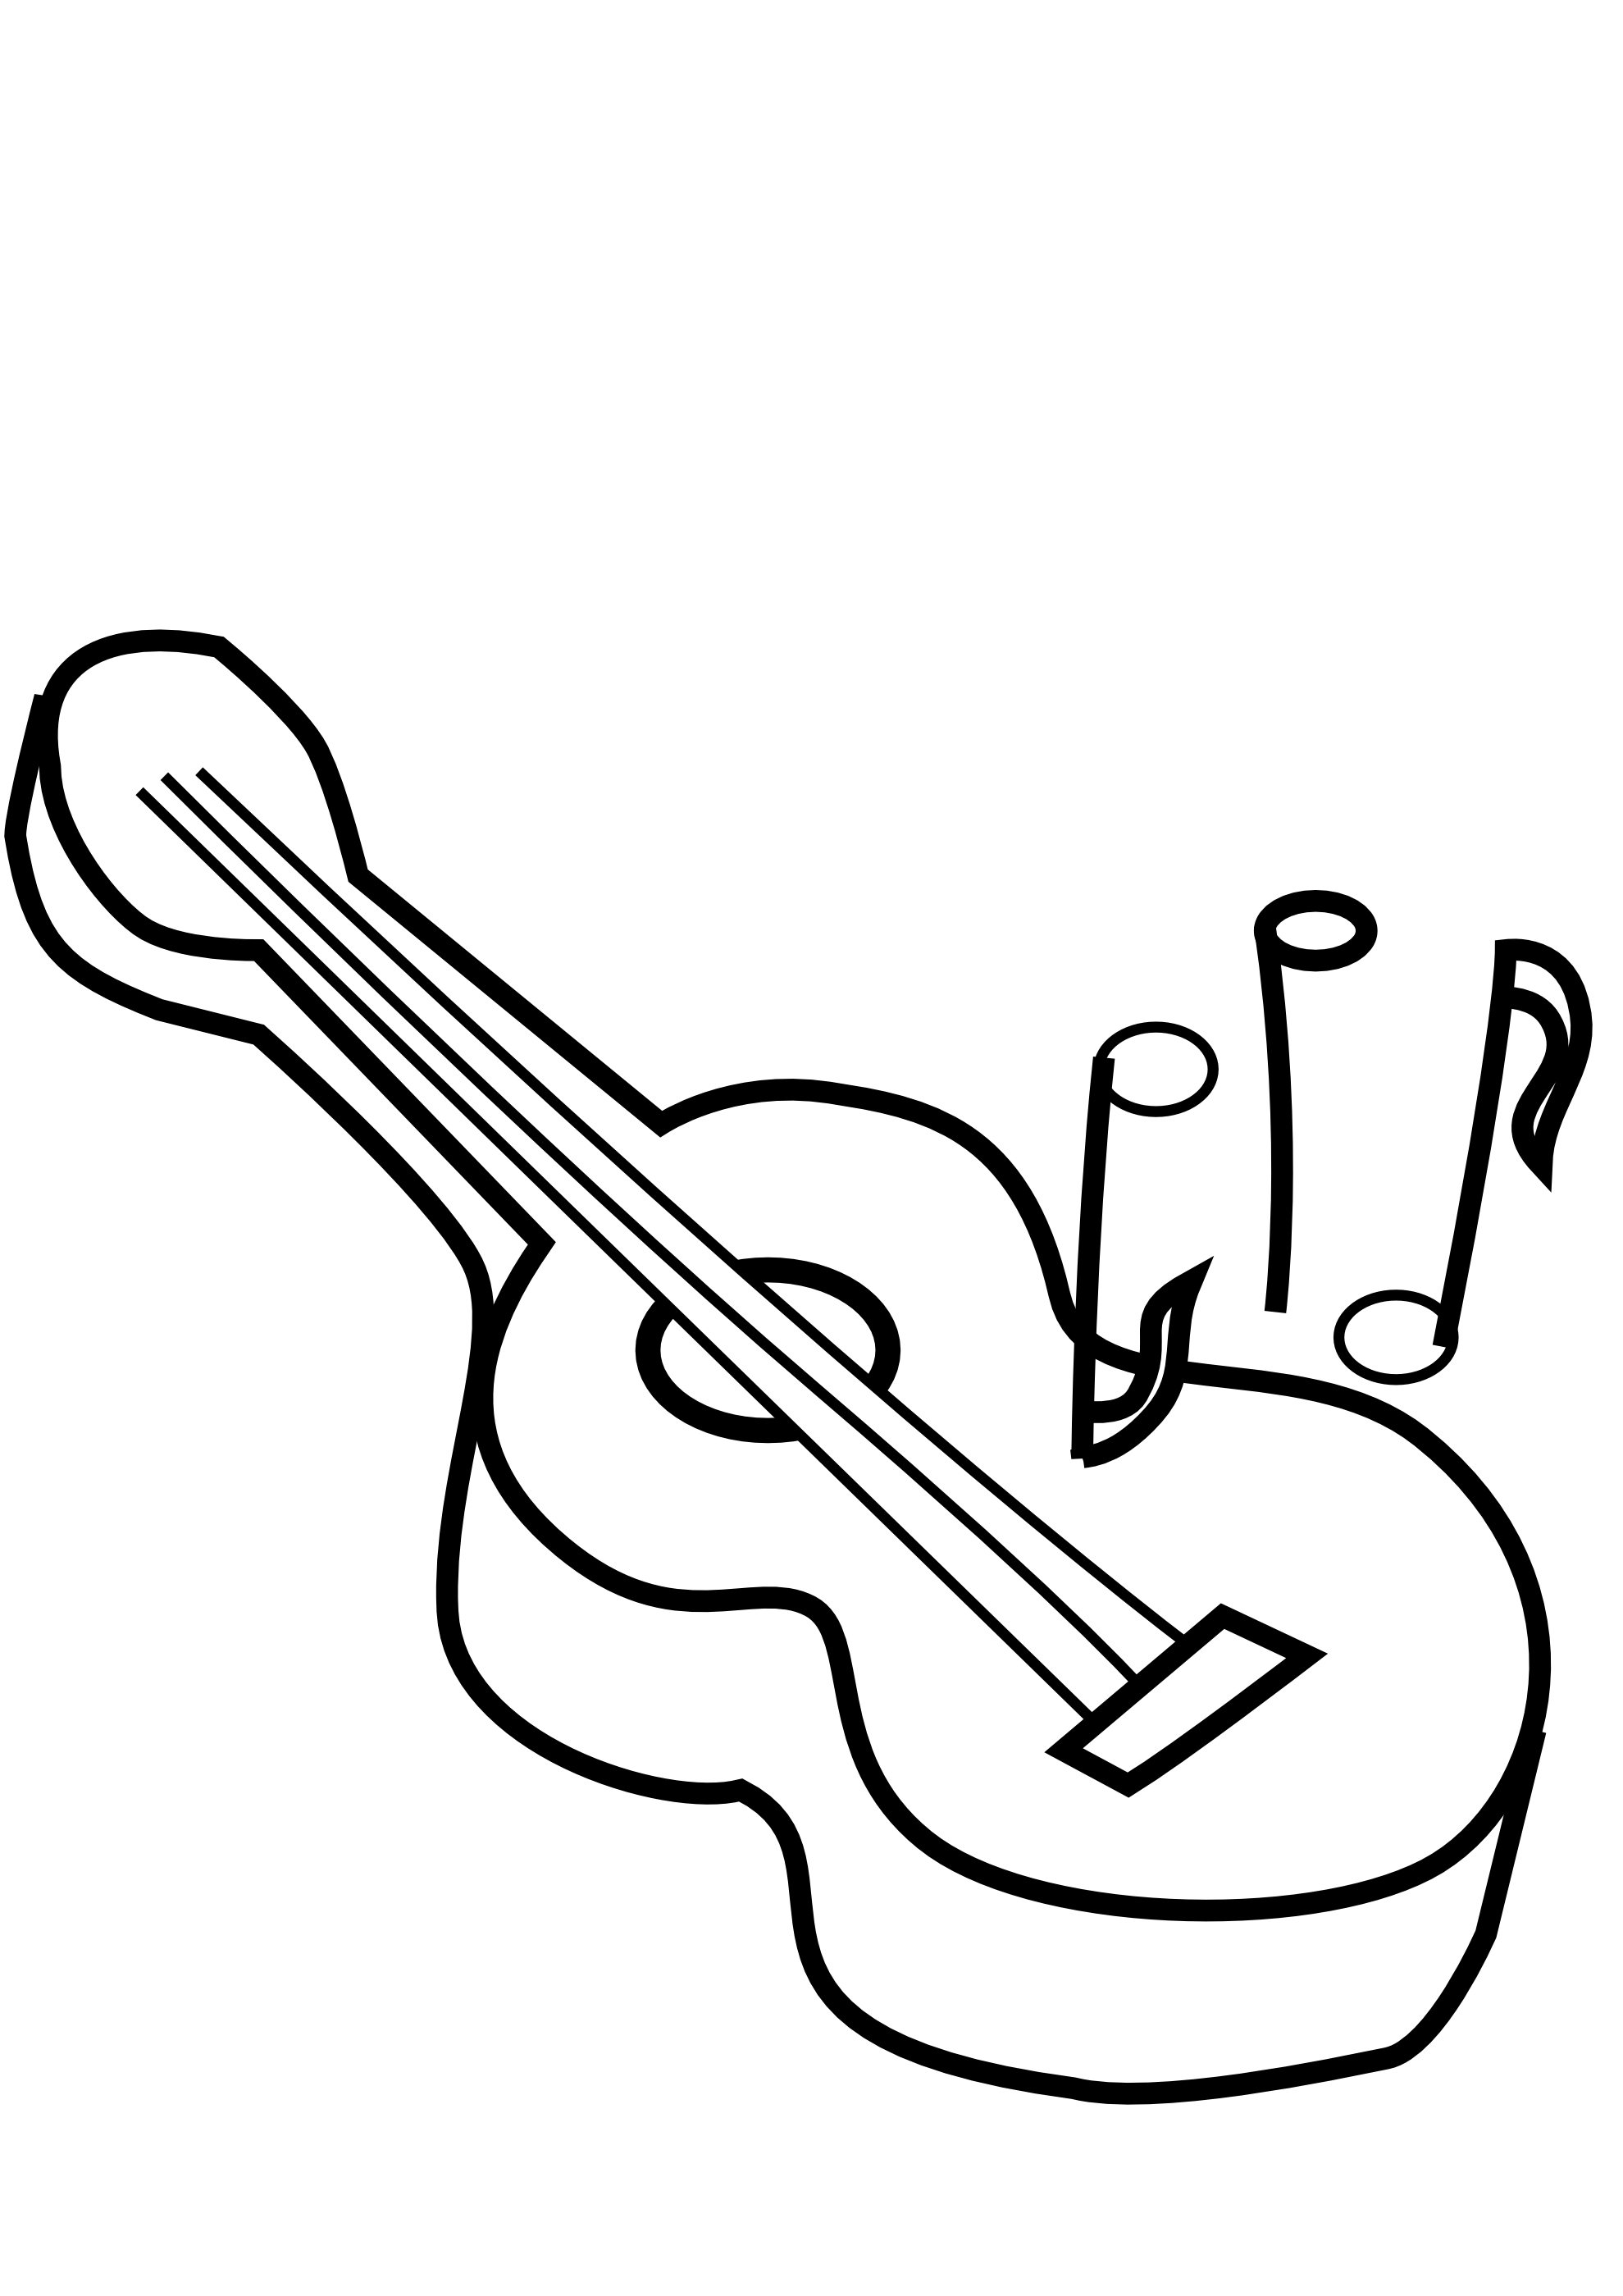 Free Guitar Black Cliparts, Download Free Clip Art, Free.